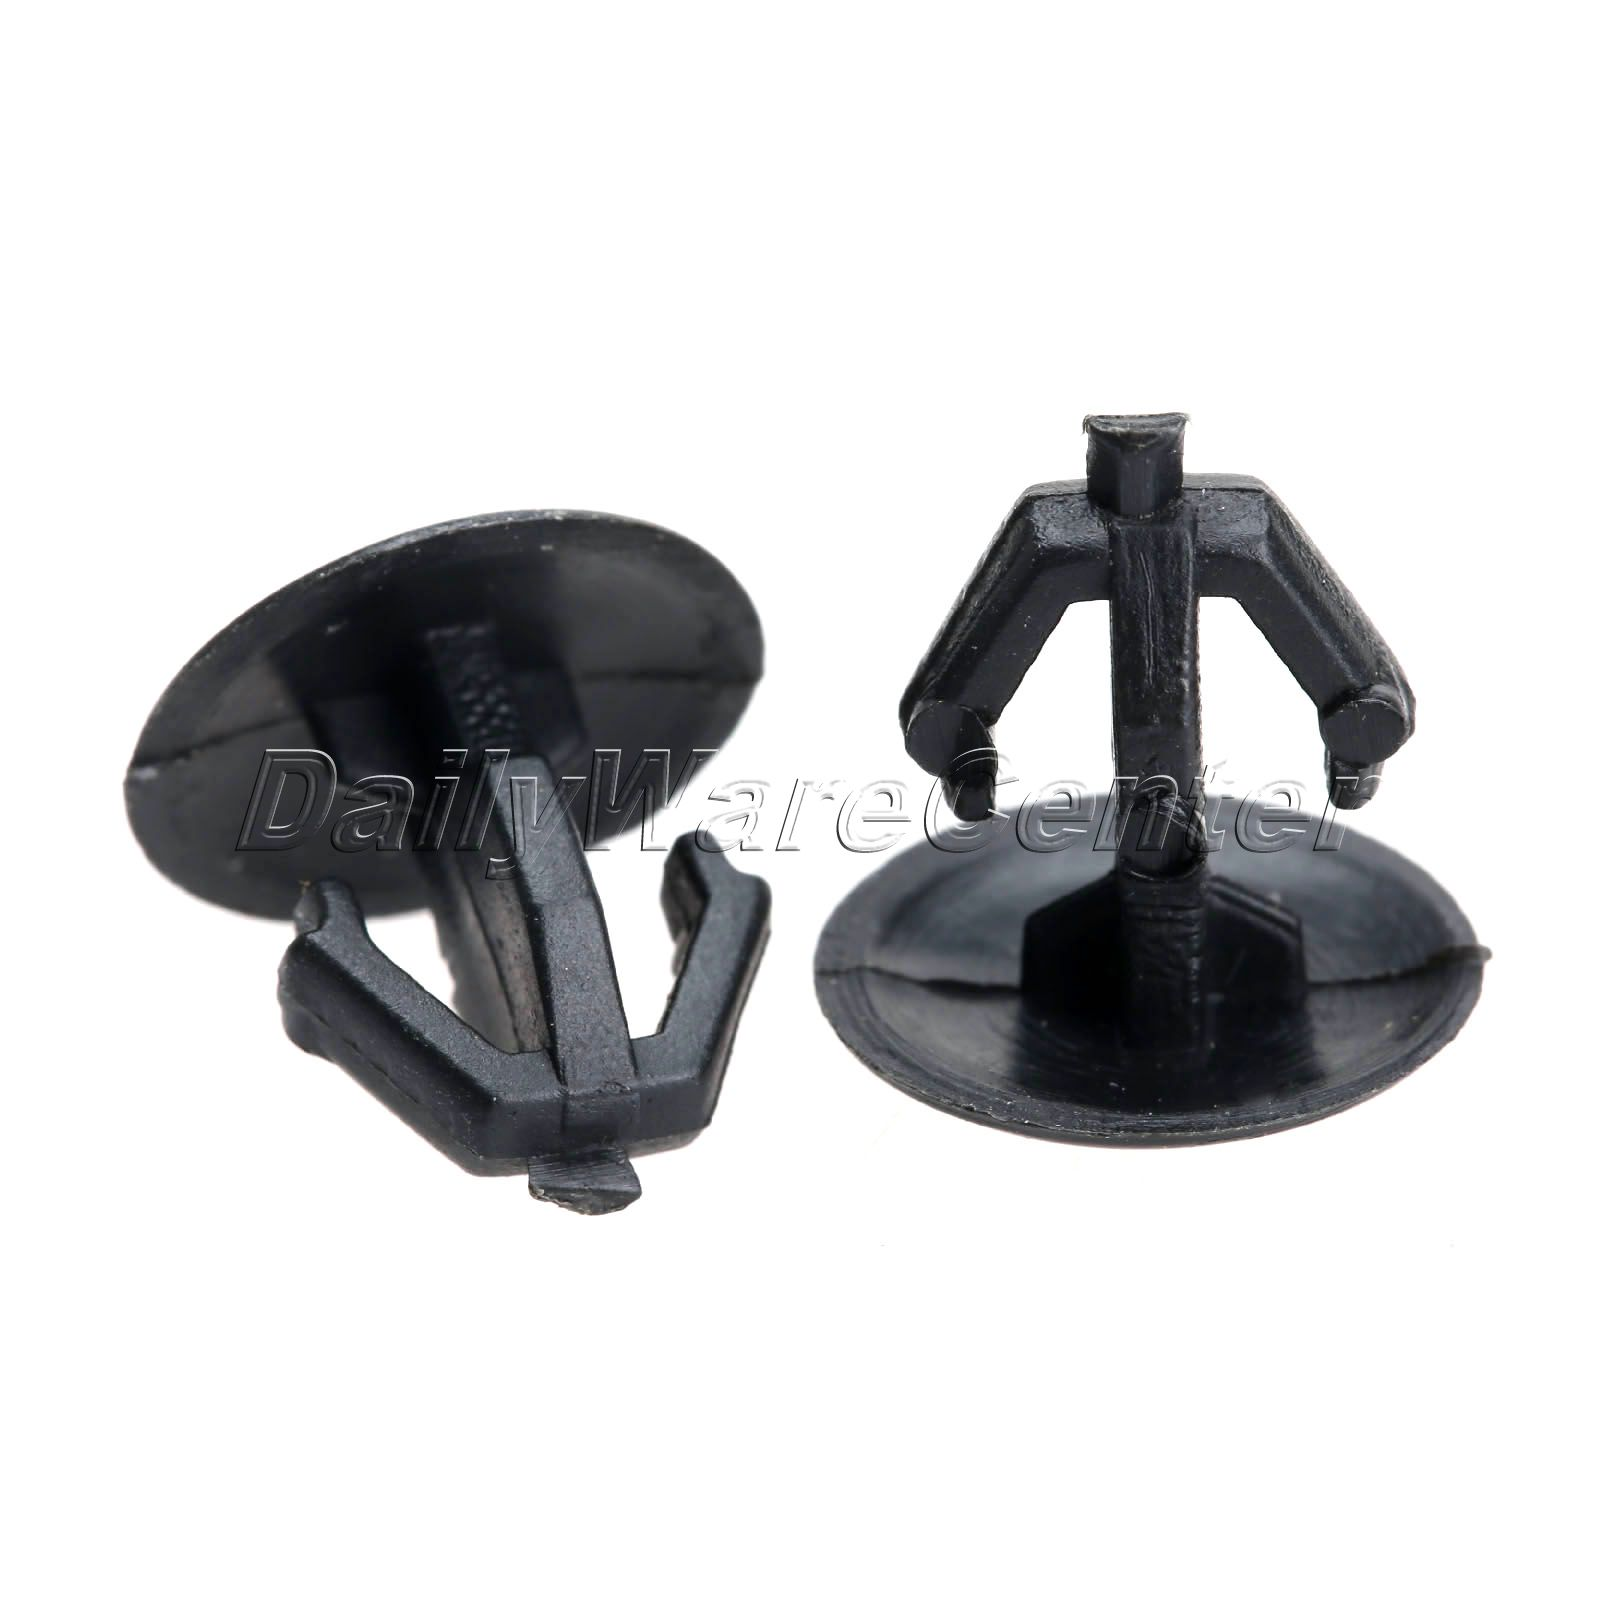 50* Black Car Plastic Sealing Nail Snaps Fastener Clips 9mm Hole Retainer Auto Trim Panel Rivet for Honda Car Styling Nylon Kits(China (Mainland))